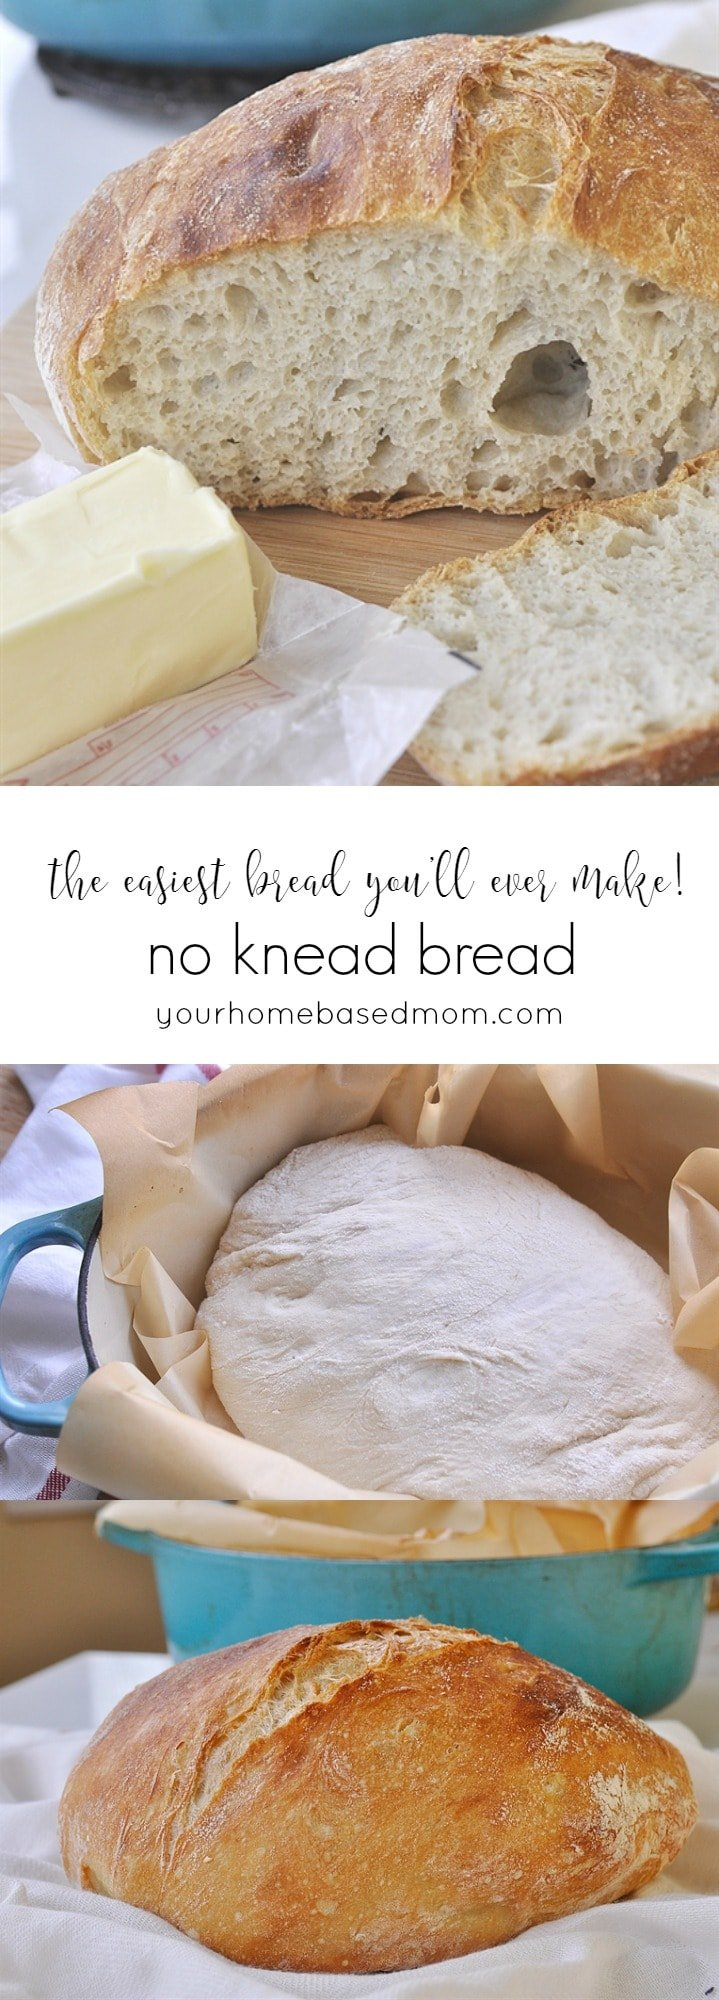 No Knead Bread @yourhomebasedmom.com